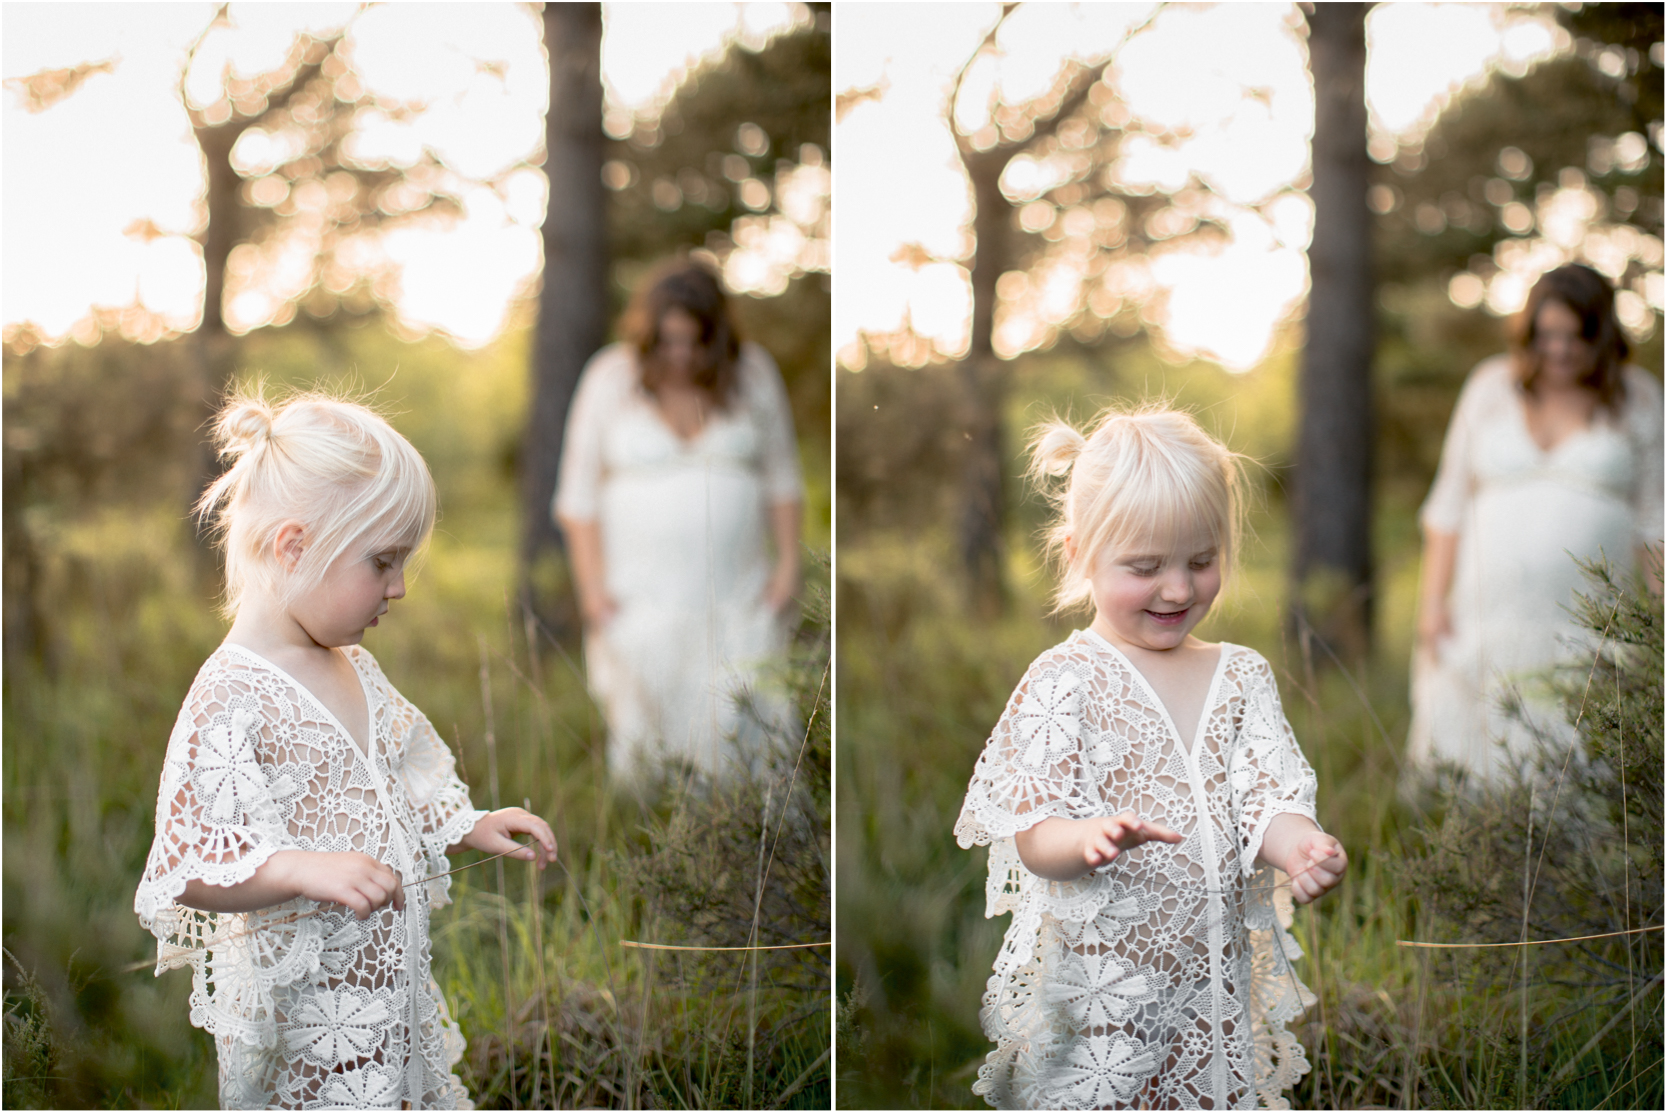 Rebecca Searle Photography Maternity Photography 10.jpg